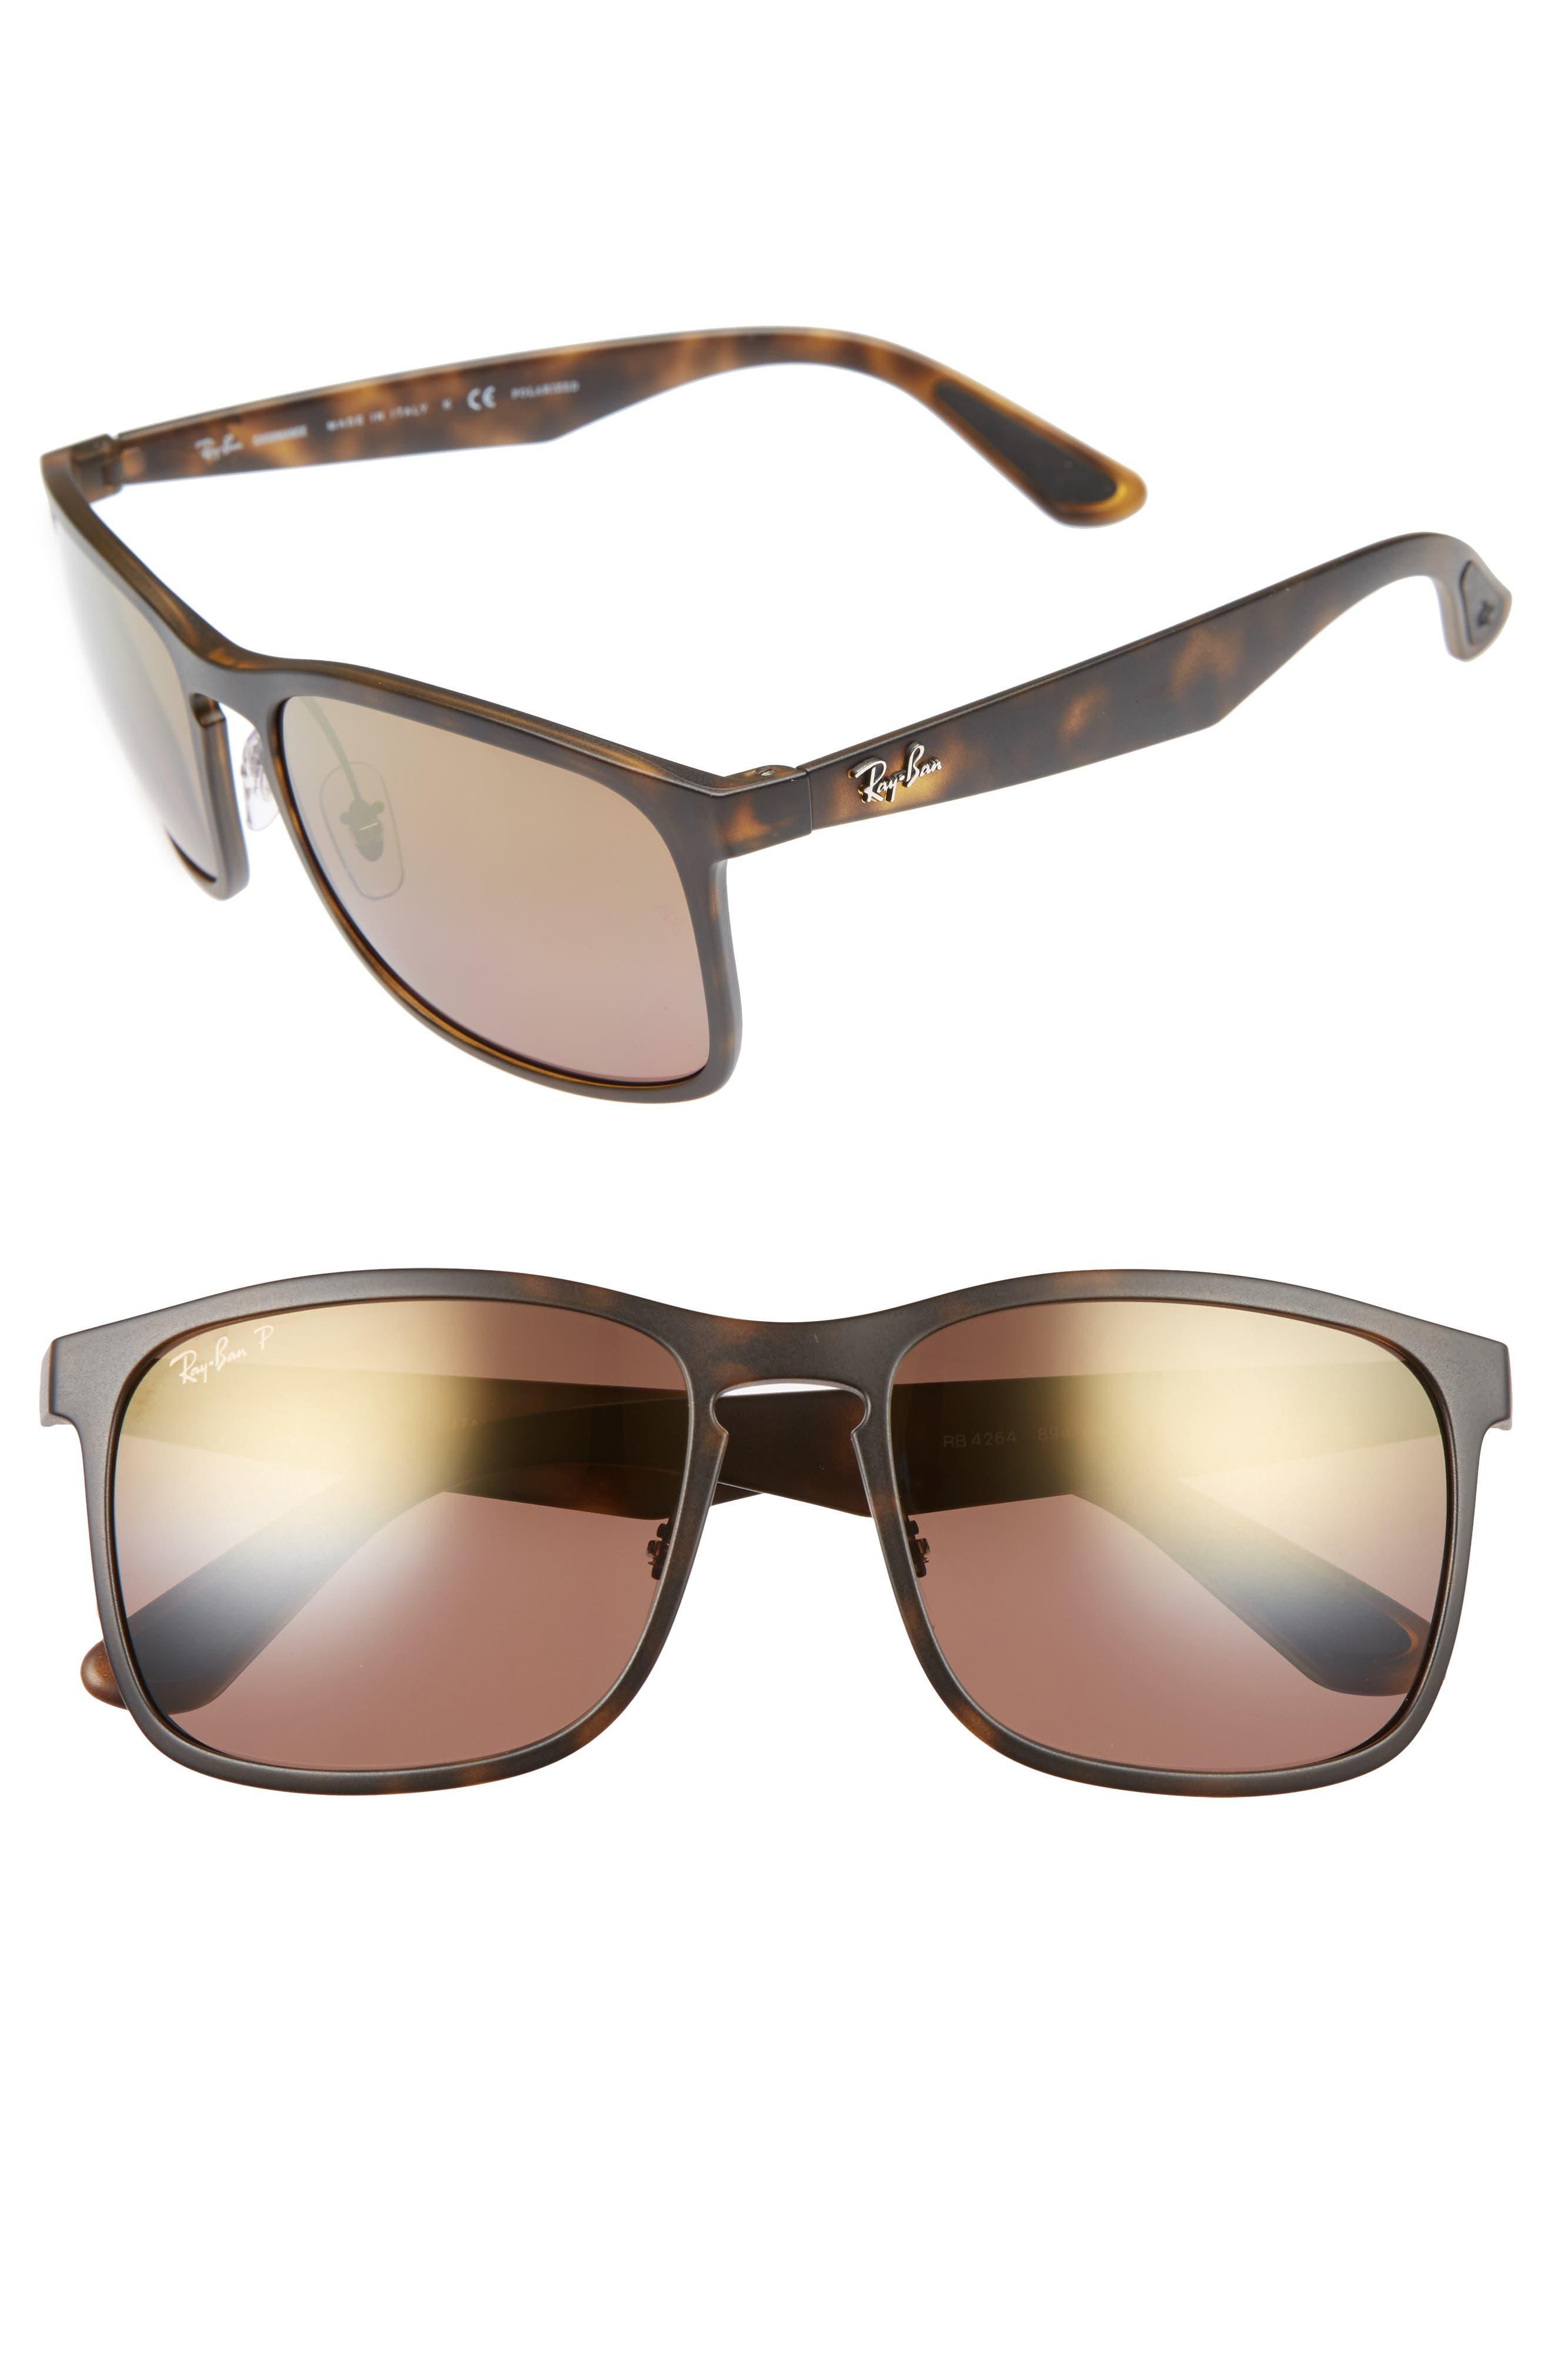 58mm Chromance Sunglasses,                             Main thumbnail 1, color,                             MATTE HAVANA/BROWN MIRROR GOLD